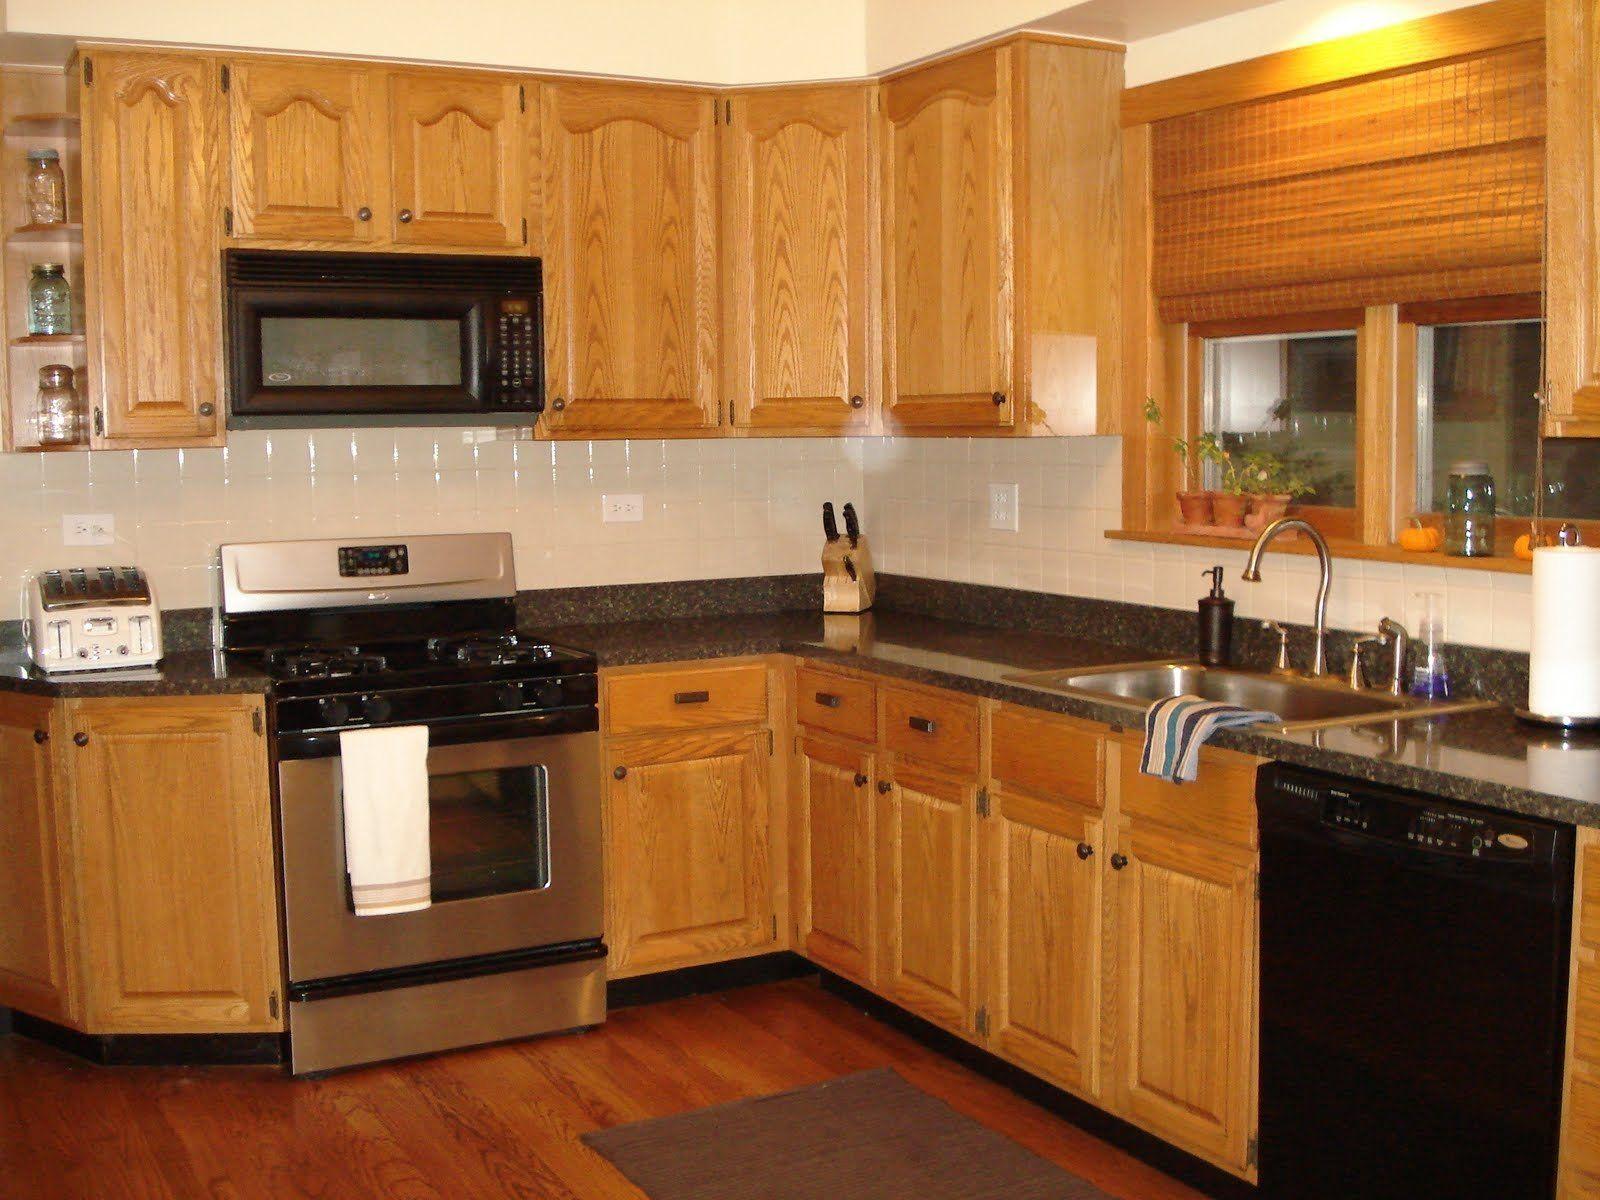 laminate flooring kitchen Kitchen white wall paint with brown wooden oak cabinet having black countertop on laminate flooring plus white tiles backsplash